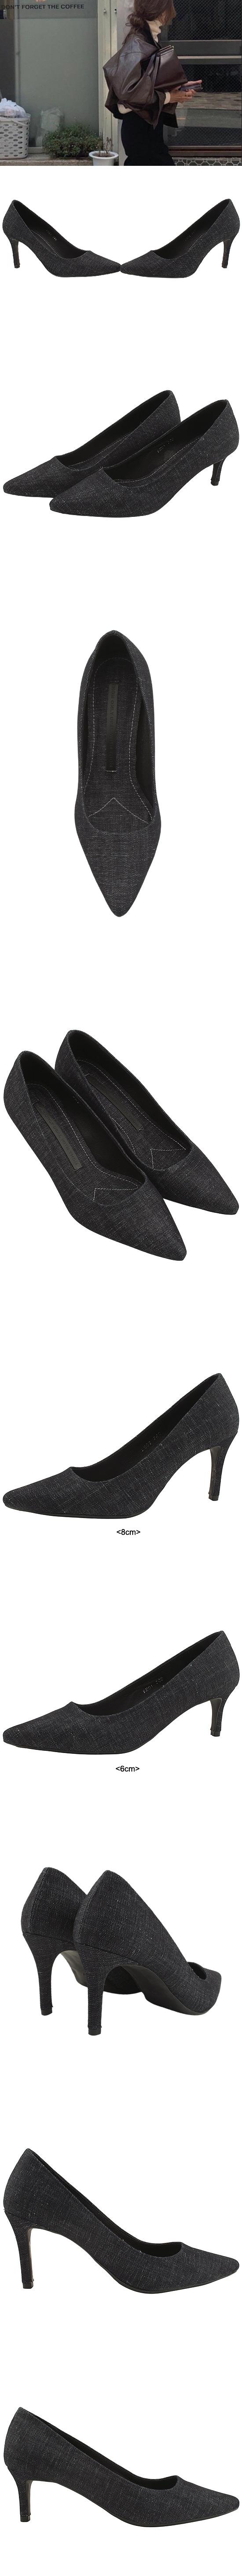 Denim Stiletto High Heels 6cm 8cm Black